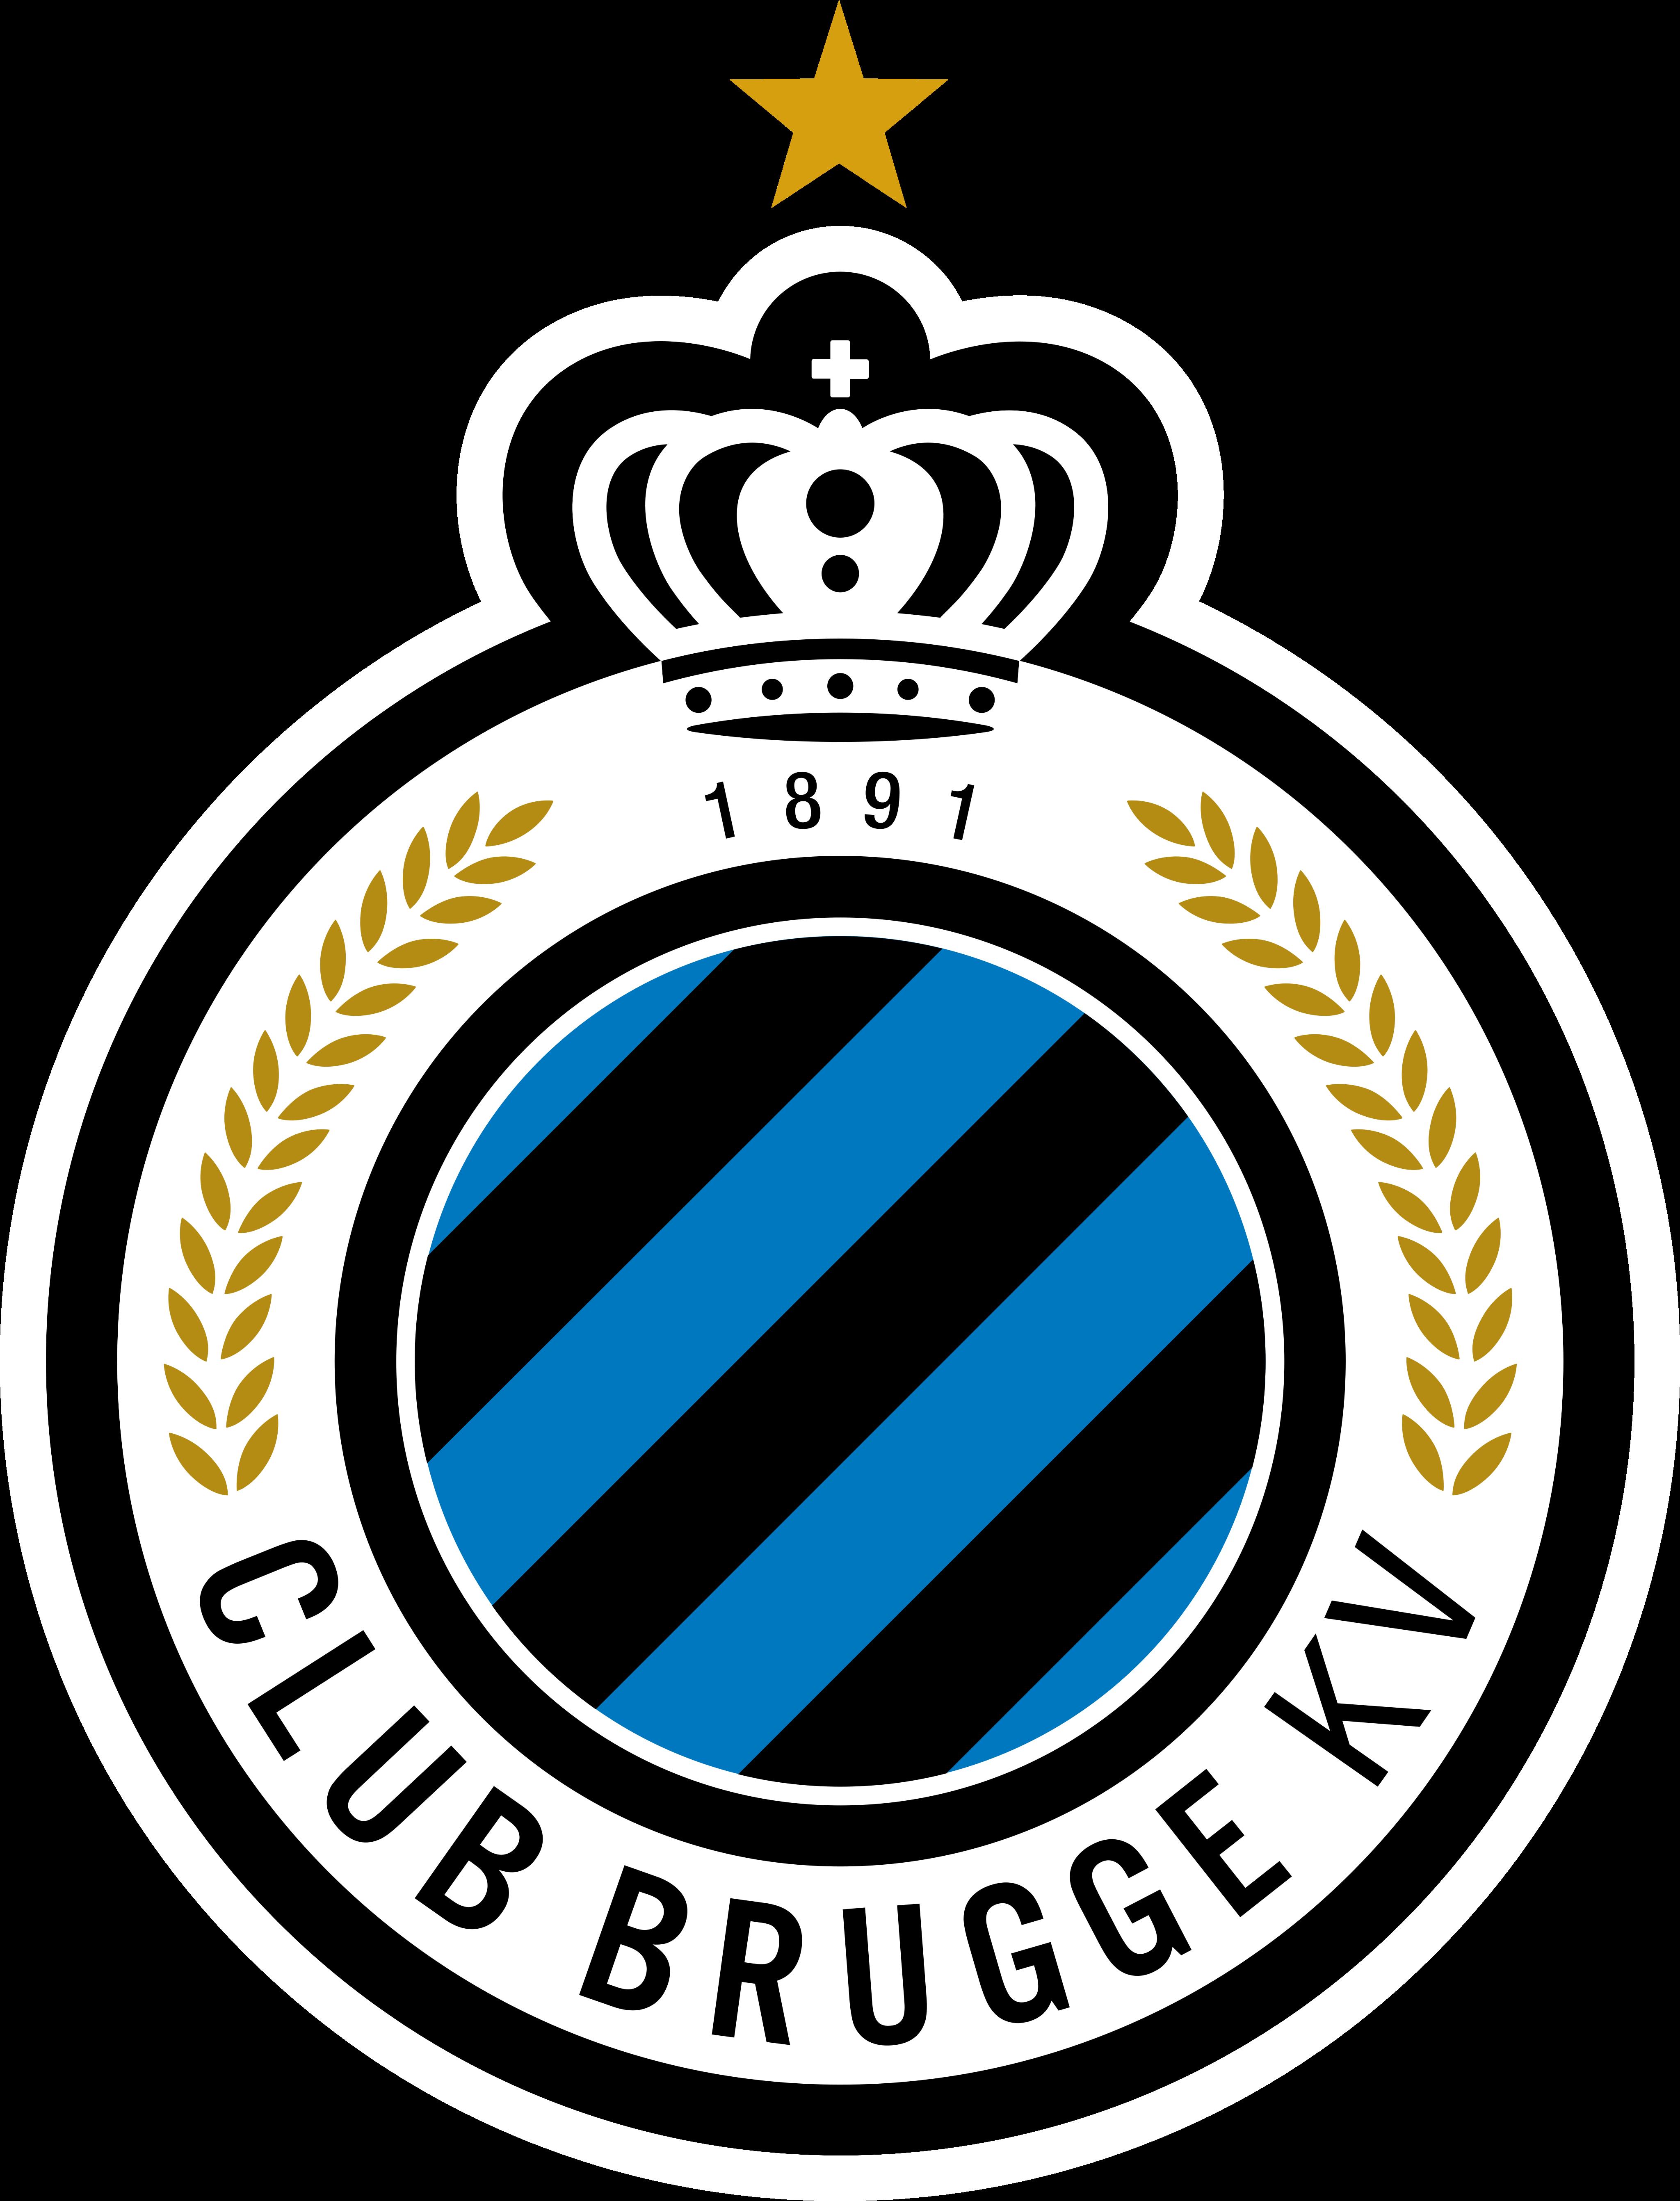 Club Brugge Logo.